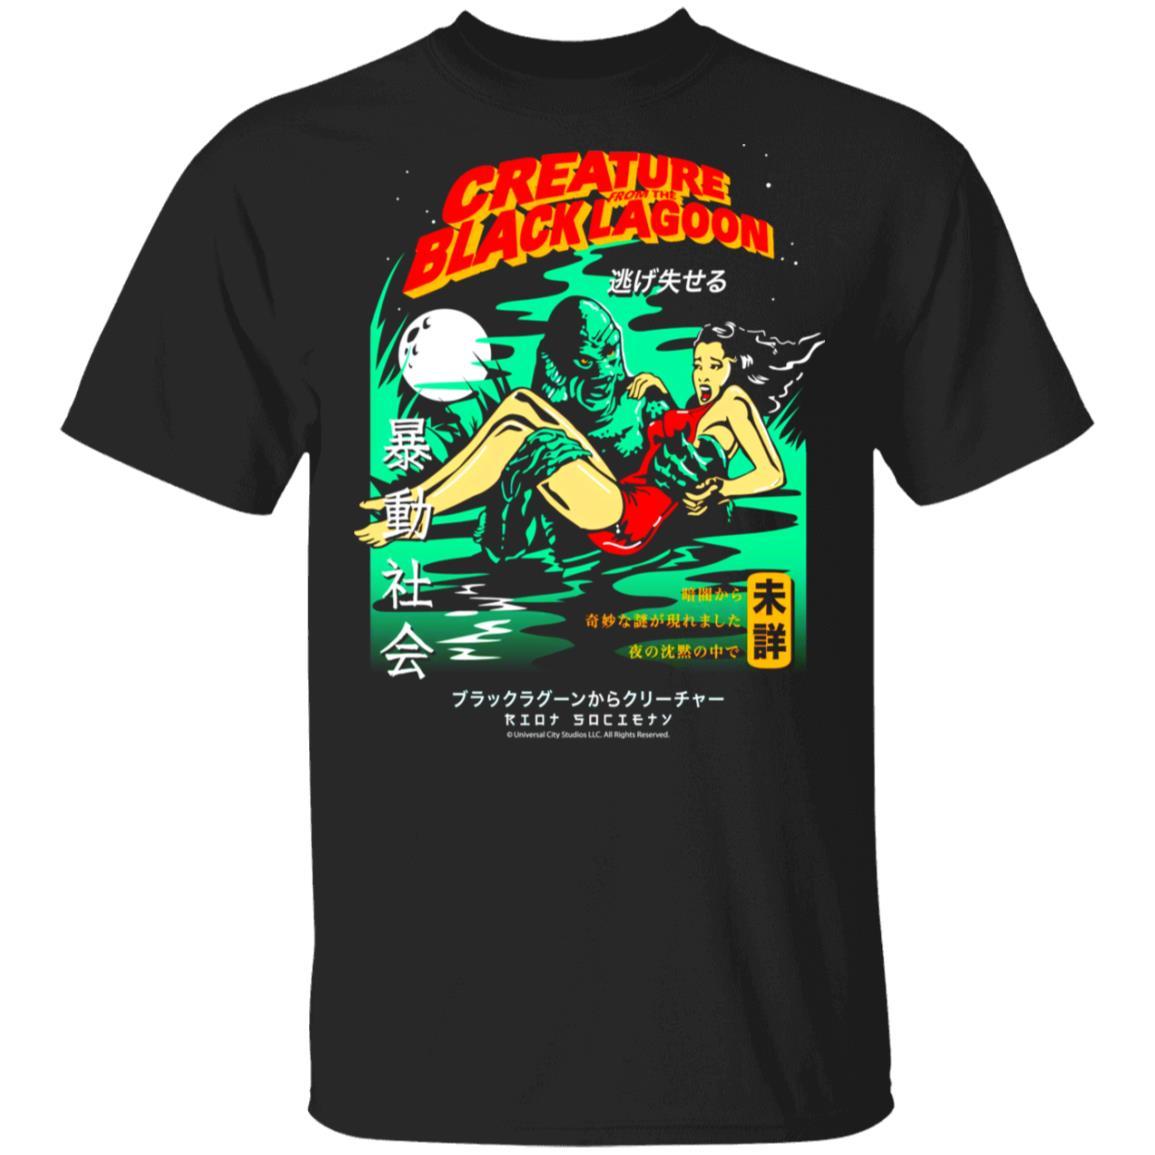 Riot Society Creature From The Black Lagoon Kanji Mens T-Shirt